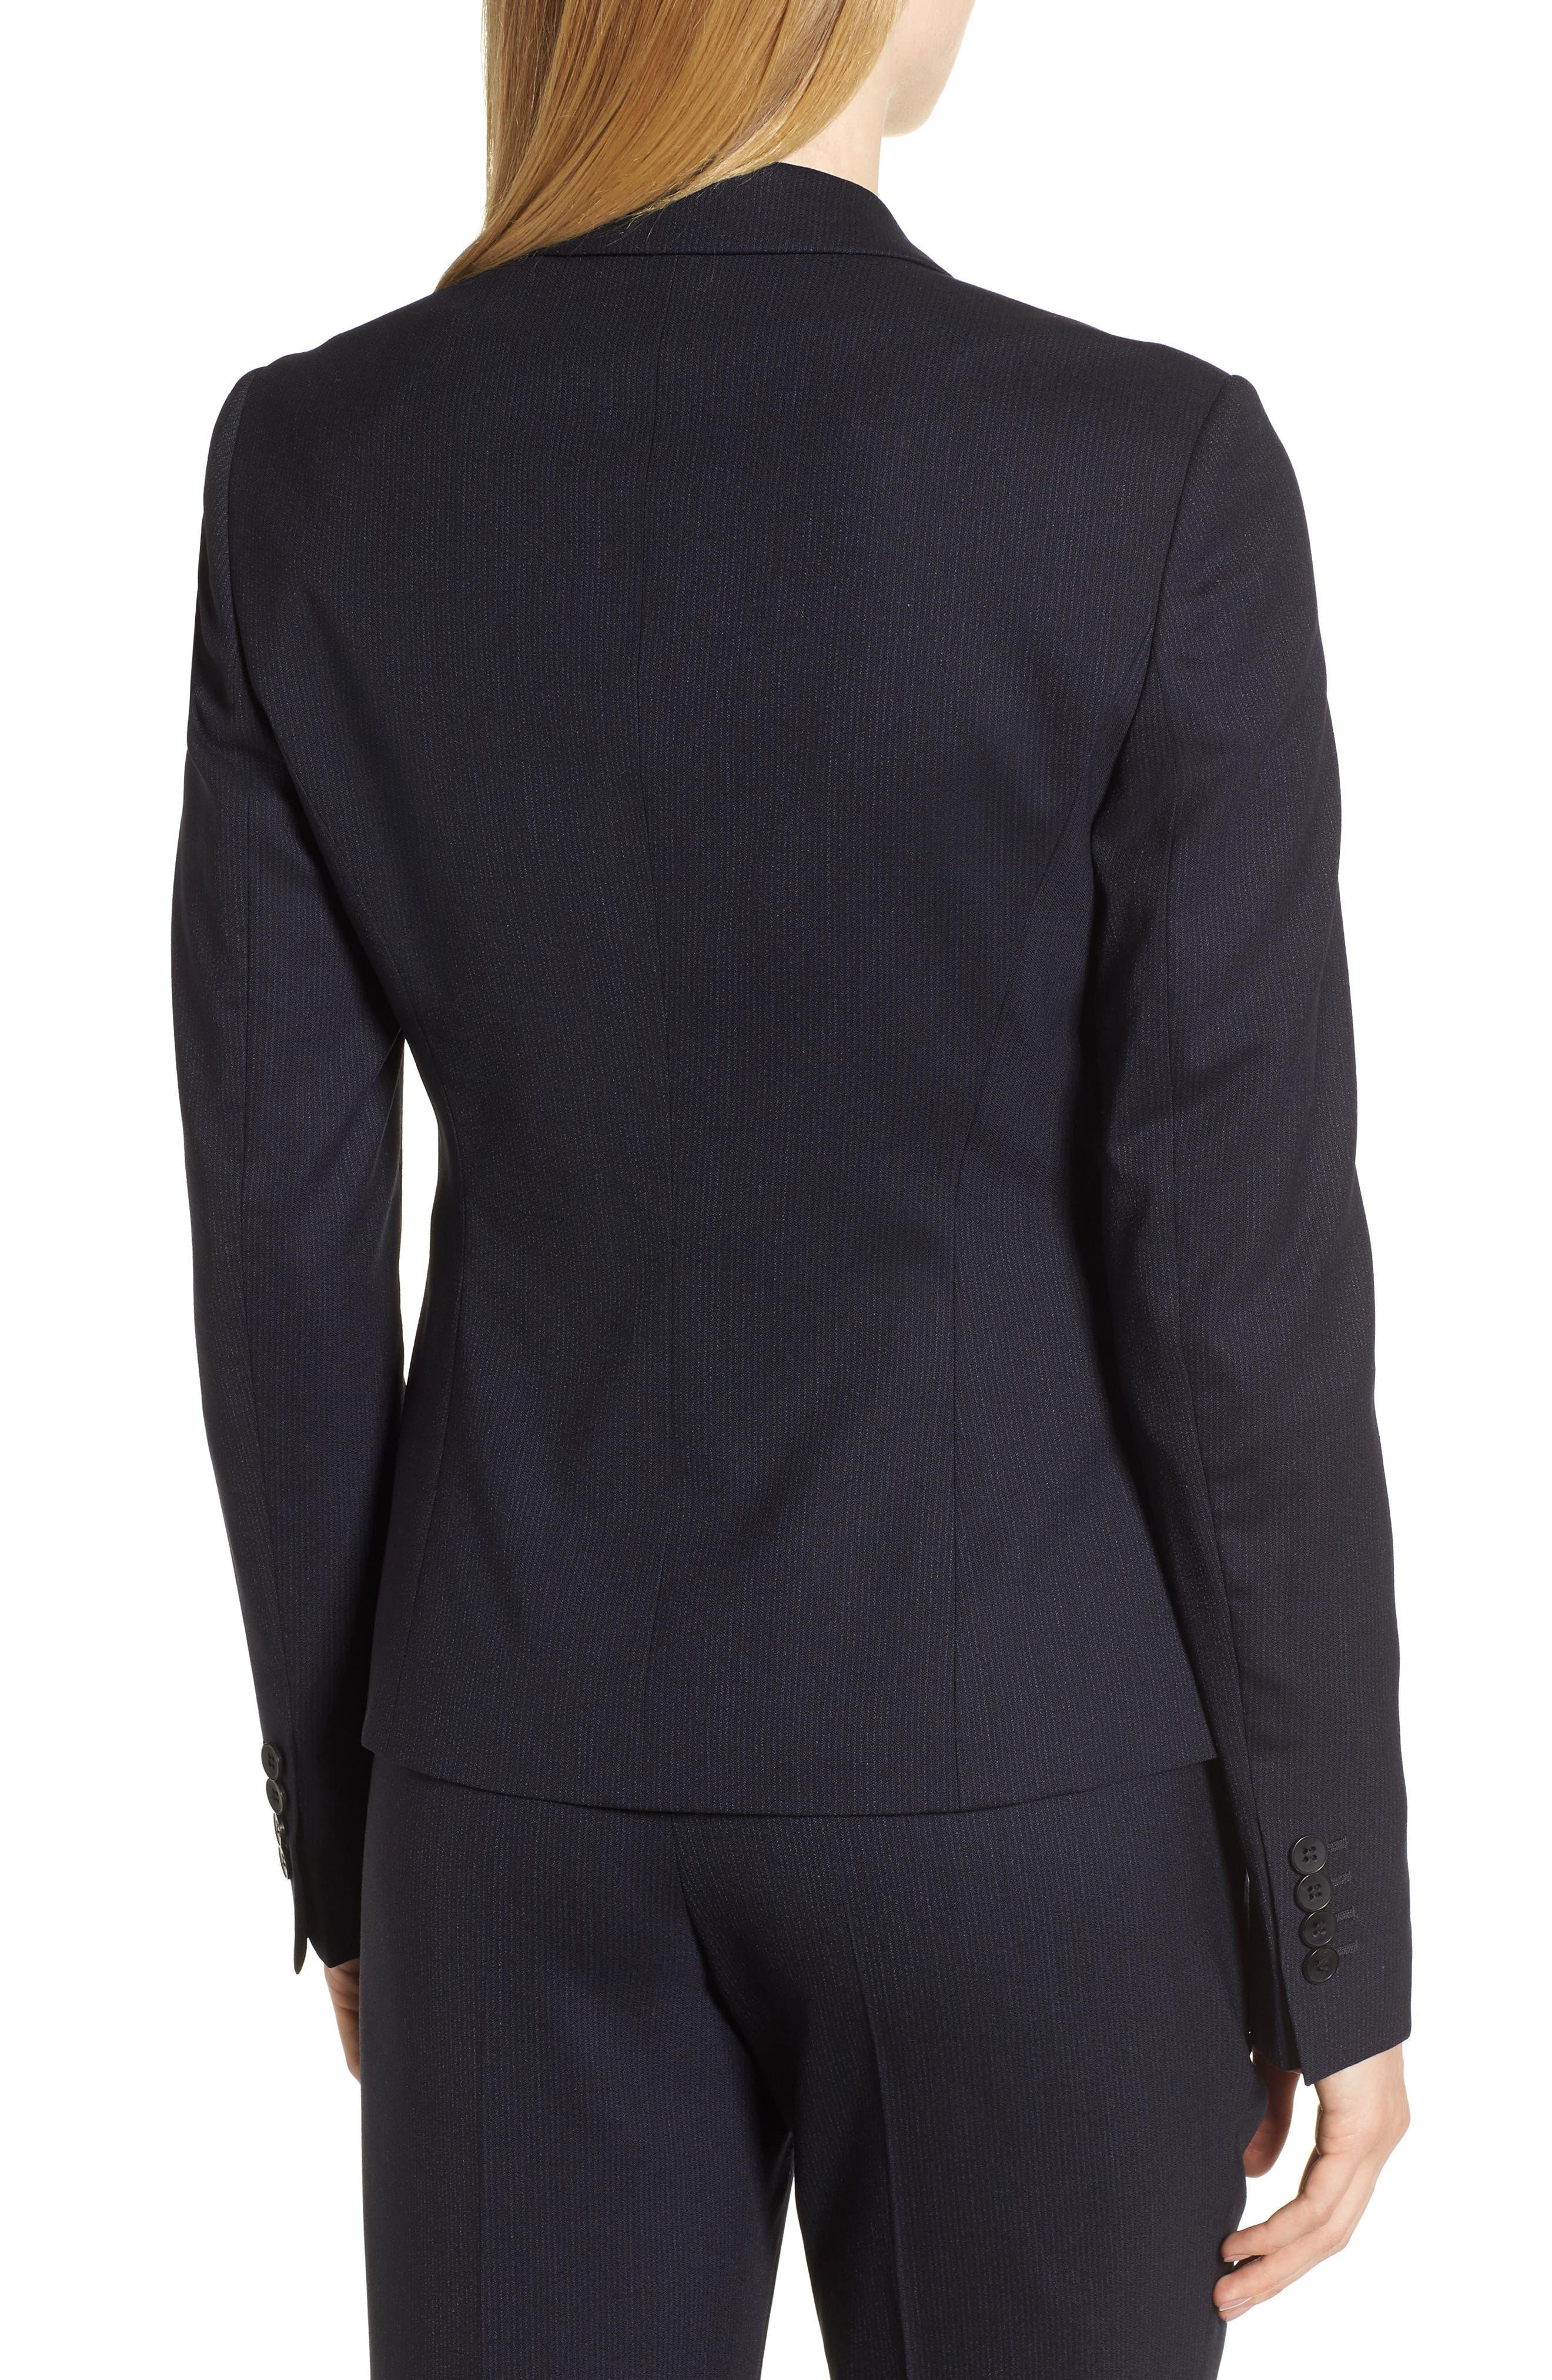 Jamahina Monostripe Stretch Wool Suit Jacket,                             Alternate thumbnail 2, color,                             468